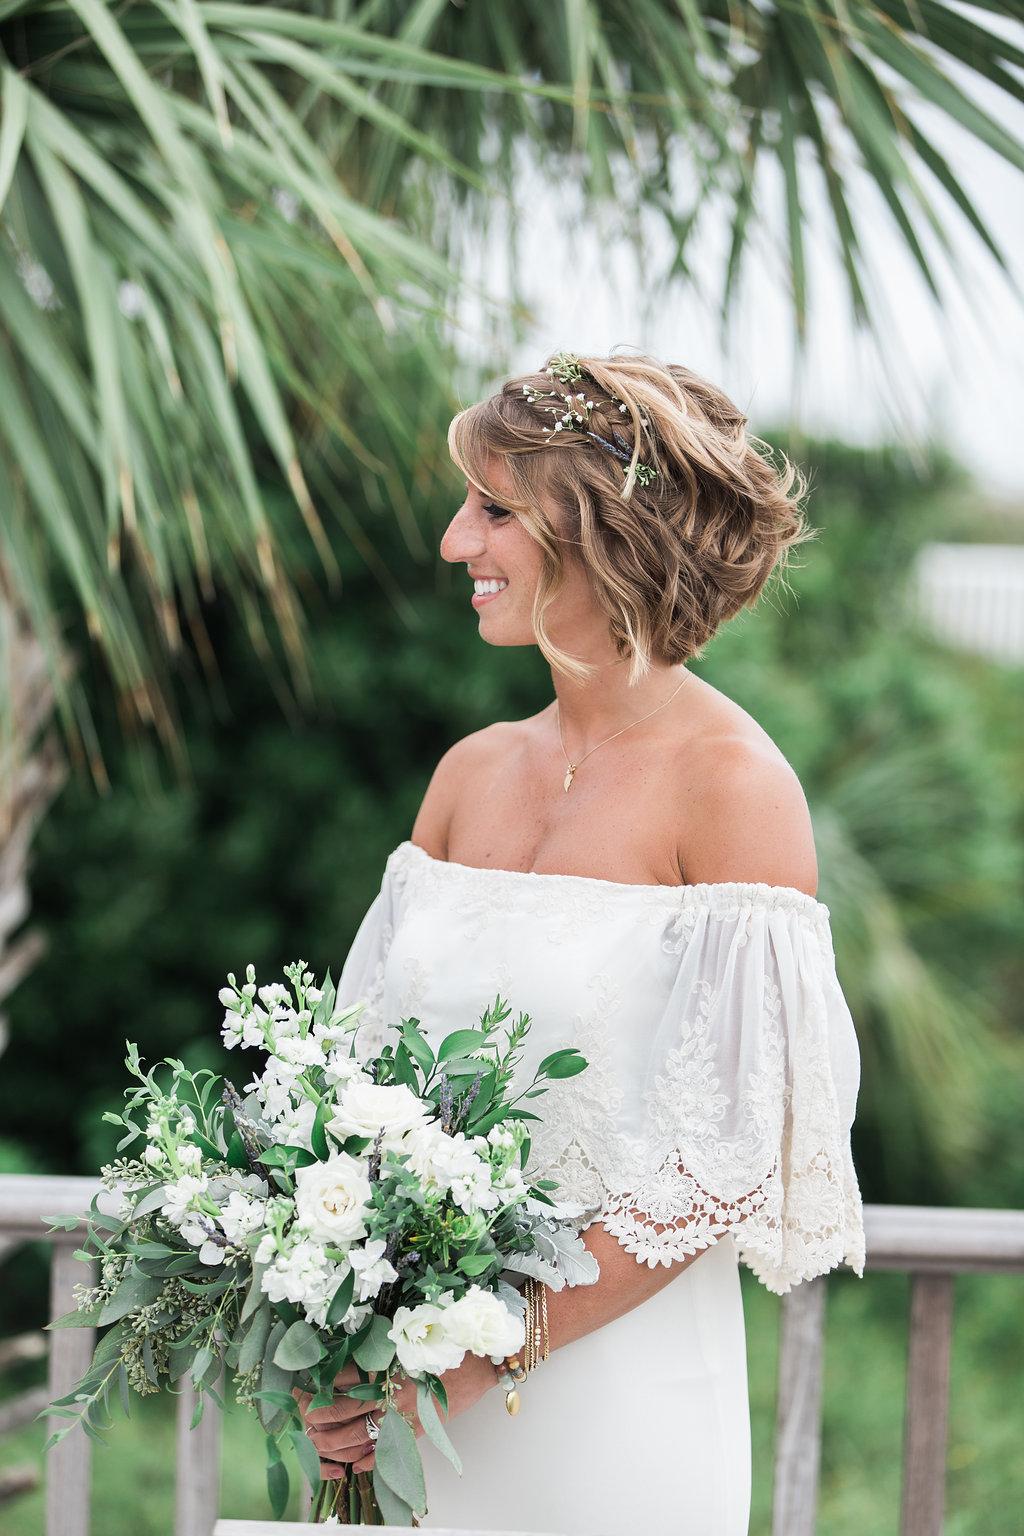 stacey-and-tj-wedding-apartment-b-photography-ivory-and-beau-bridal-boutique-savannah-wedding-dresses-daughters-of-simone-lu-boho-bride-boho-wedding-savannah-boho-wedding-savannah-weddings-savannah-bridal-gowns-savannah-wedding-18.jpg